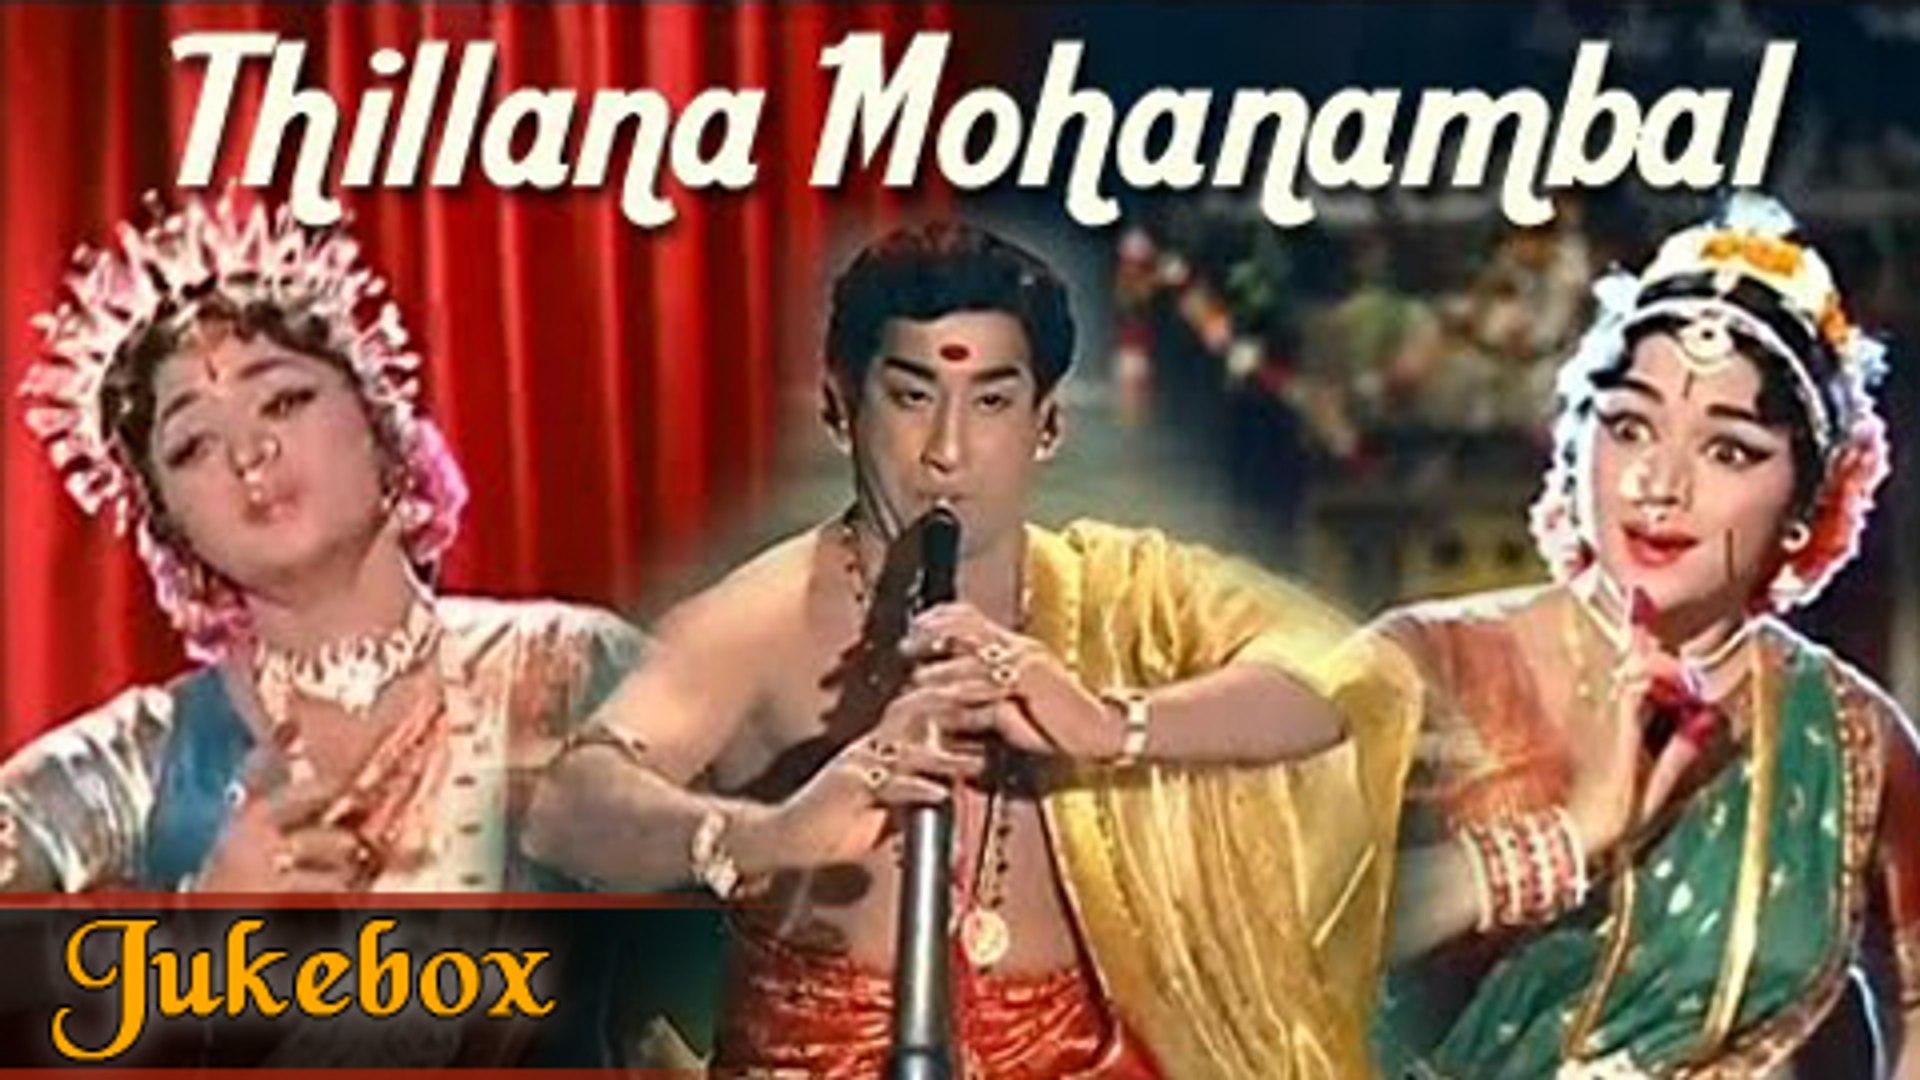 Thillana mohanambal nadaswaram bitcoins sports betting system free